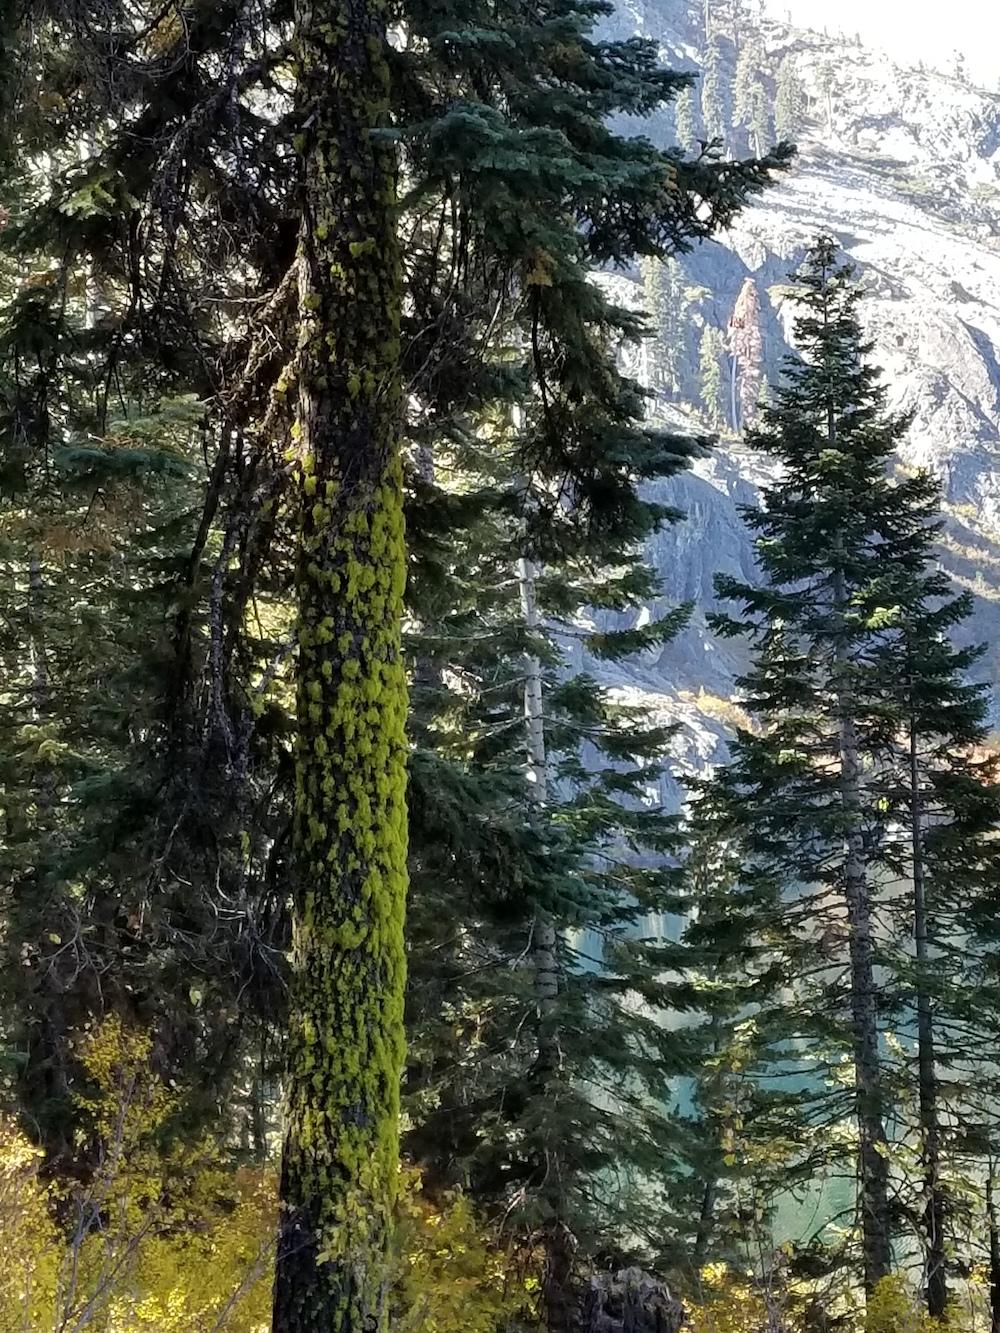 TRAILclothleather.com_Mount-Shasta-Color-Story20171007_111131 copy.jpg